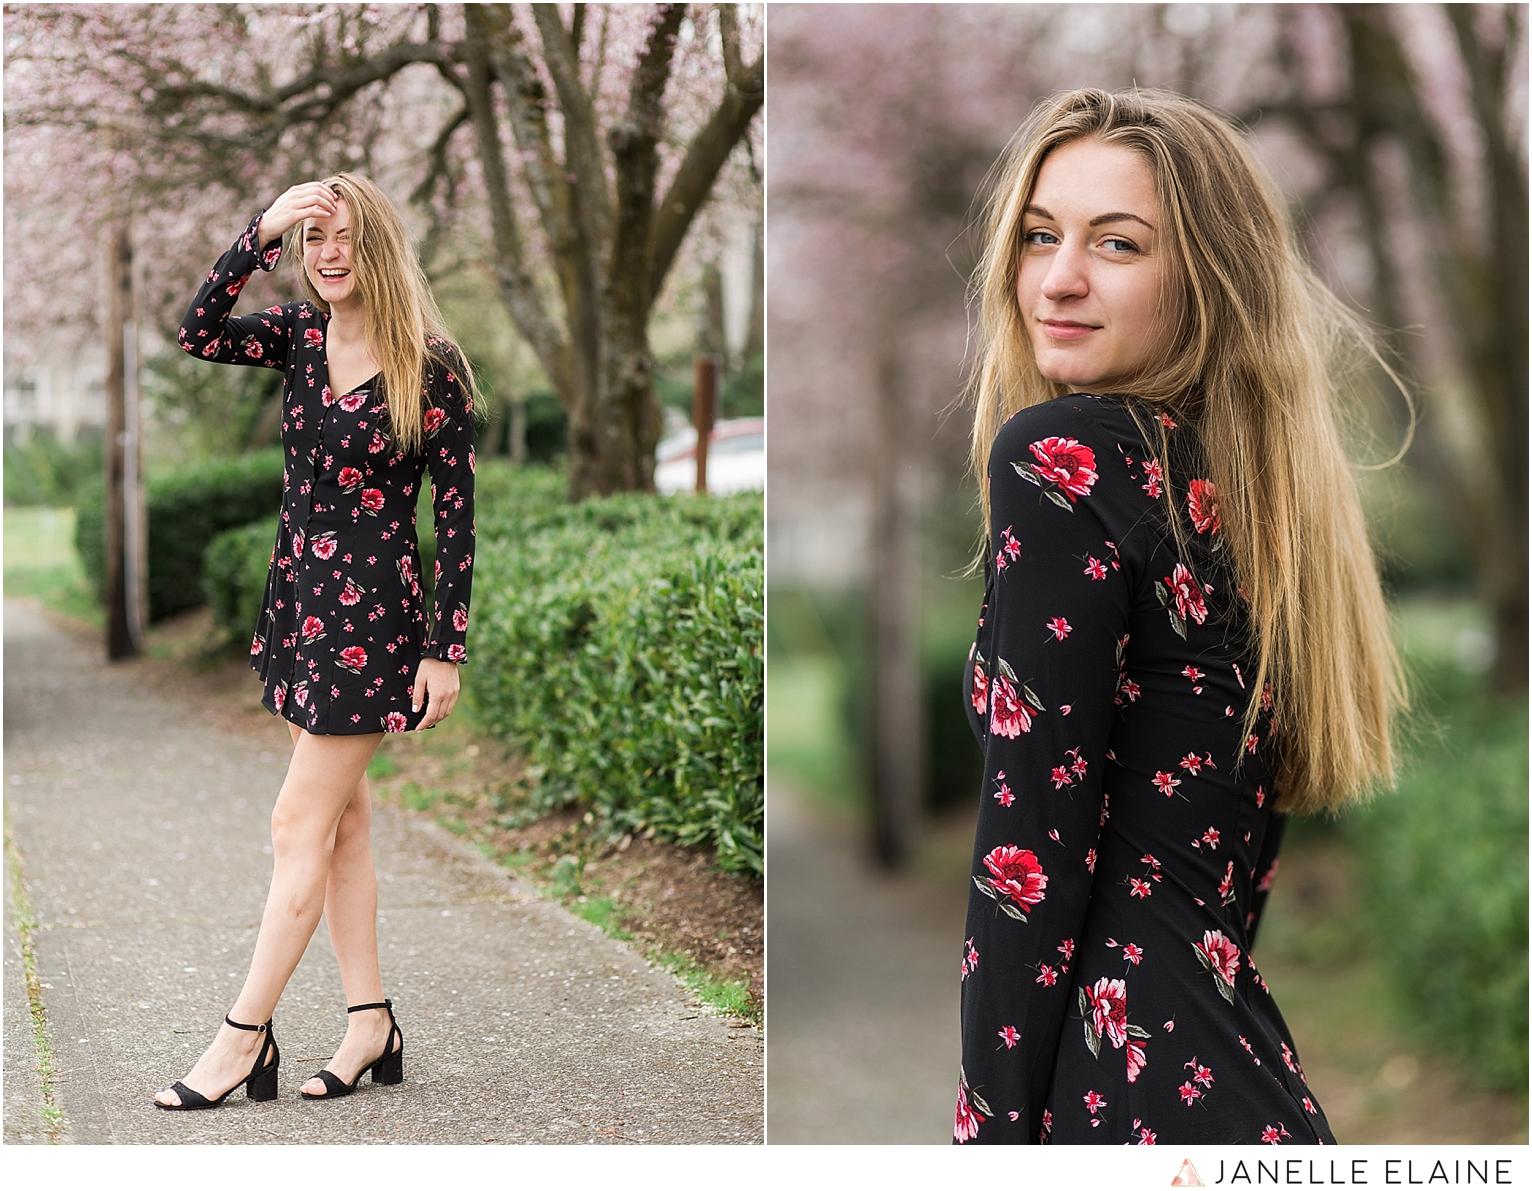 kirsi-renton wa portrait sesssion-cherry blossom-h&m dress-seattle photographer janelle elaine photography-12.jpg